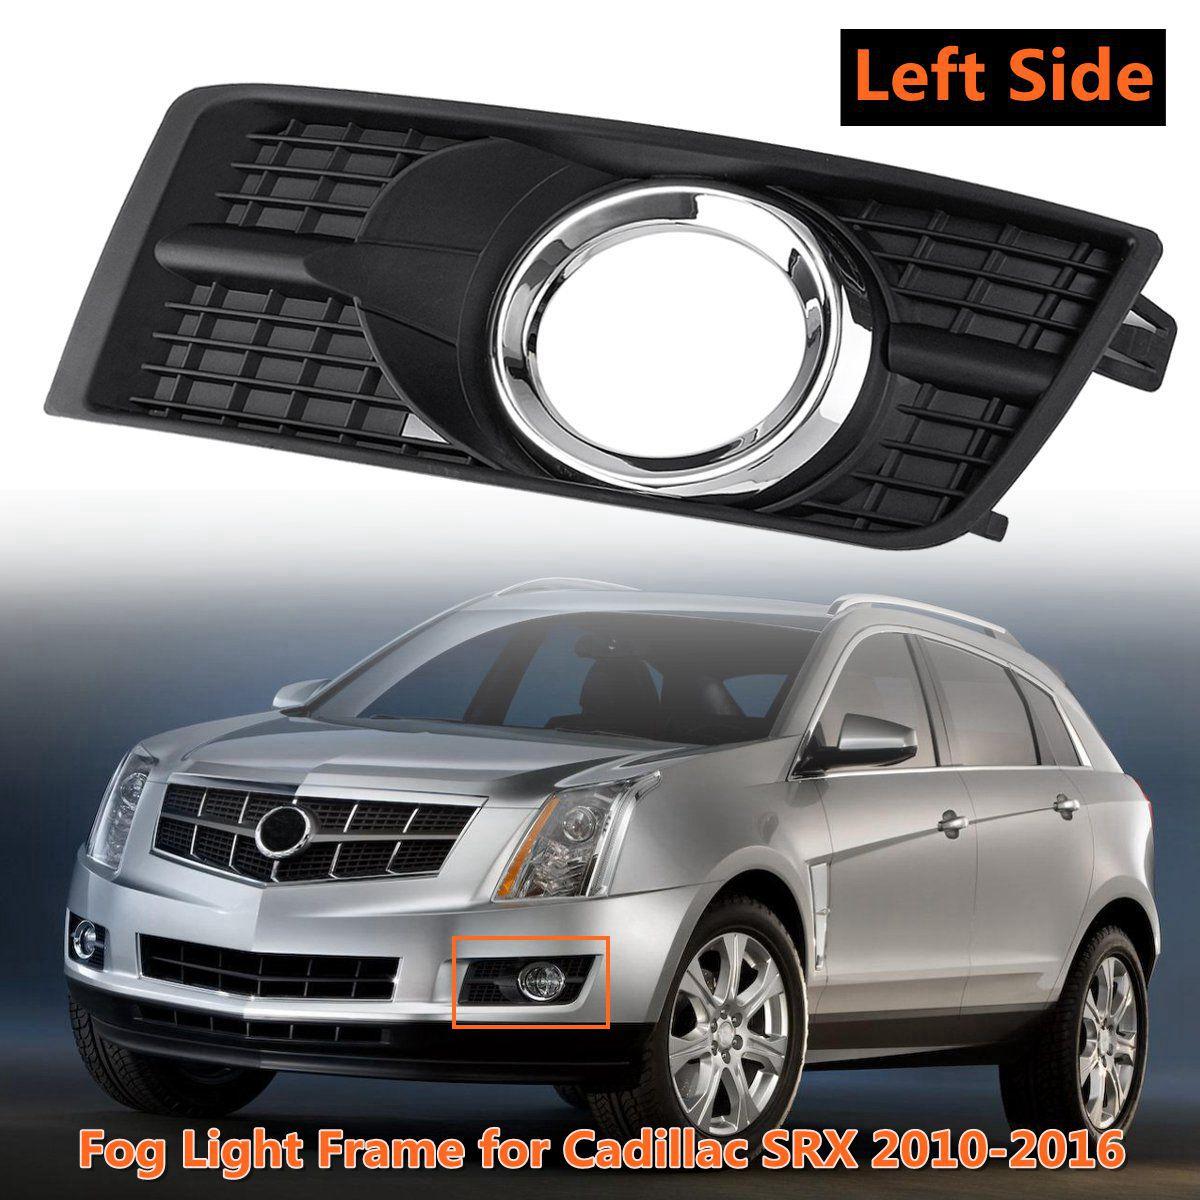 medium resolution of front bumper fog light frame grilling cover foglamp trim shell cap garnish hood for cadillac srx